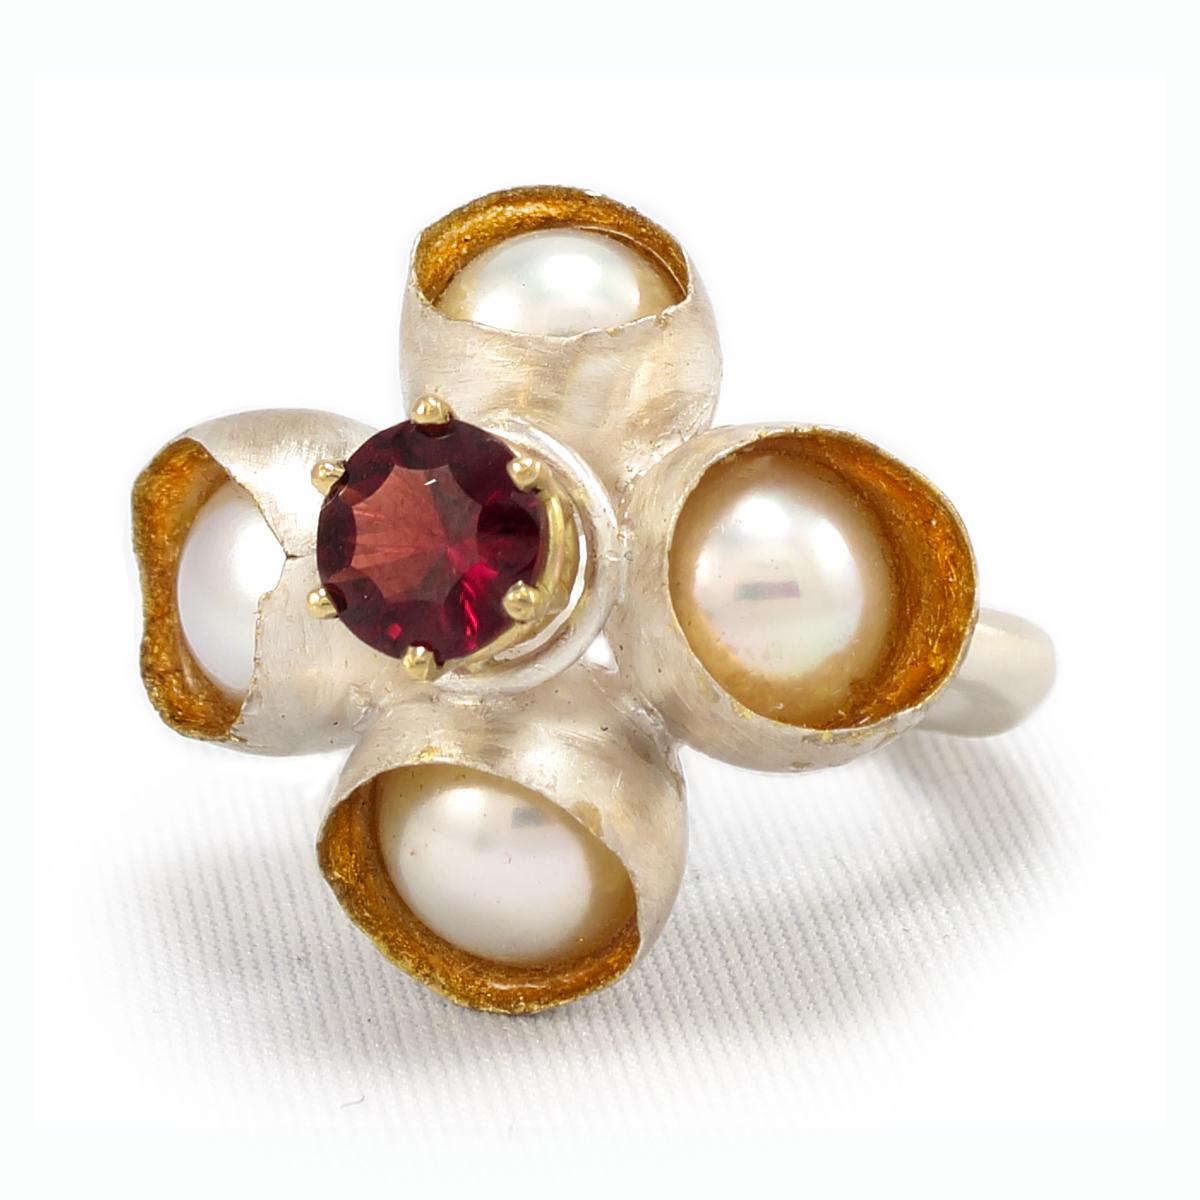 Queen of Hearts, ring